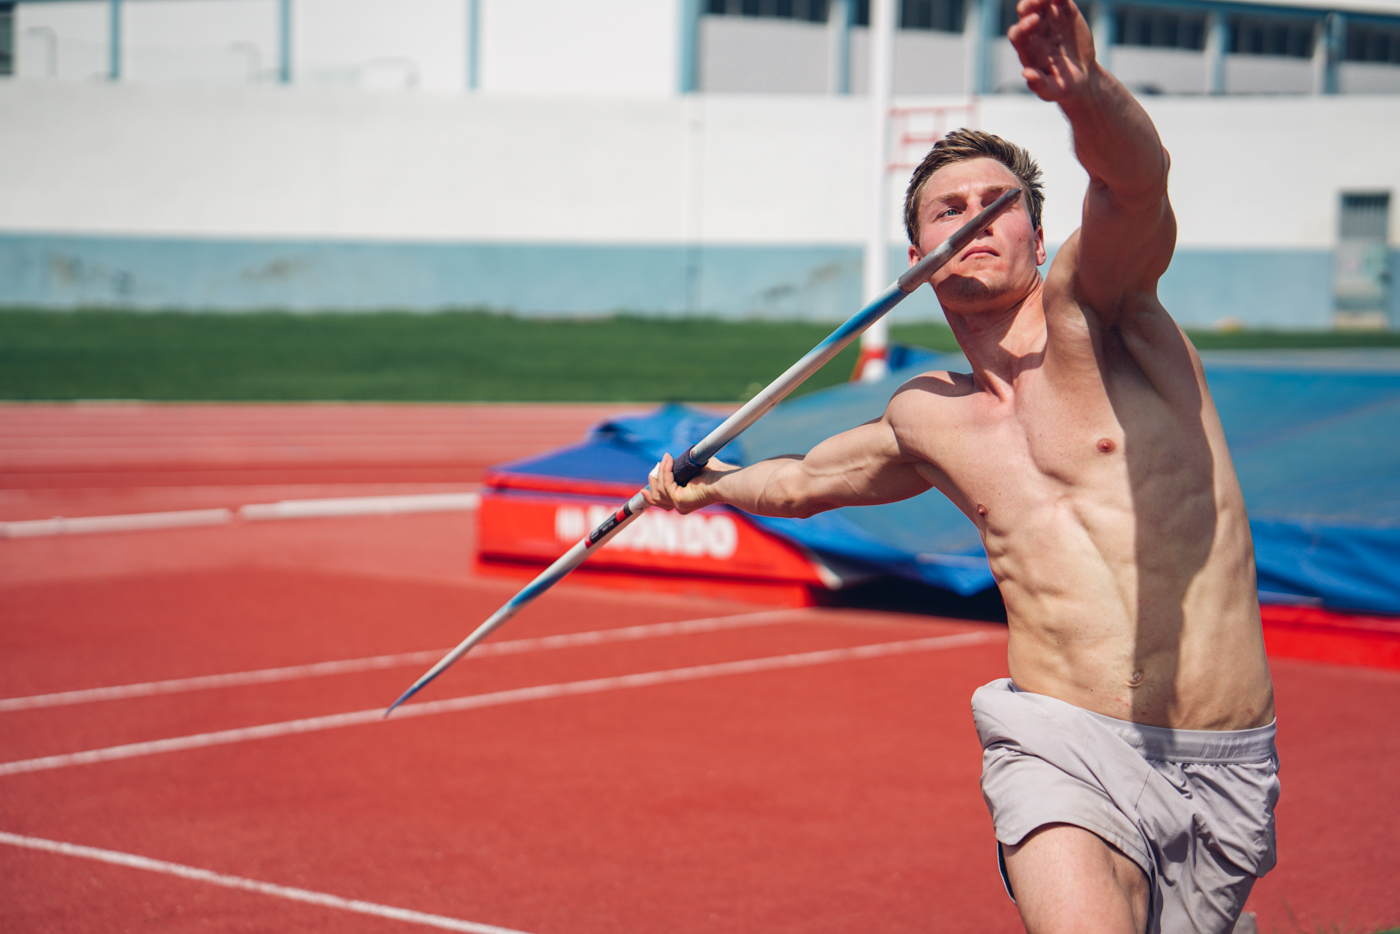 Thomas Röhler im Trainingslager in Portugal mit Speer beim Speerwurf